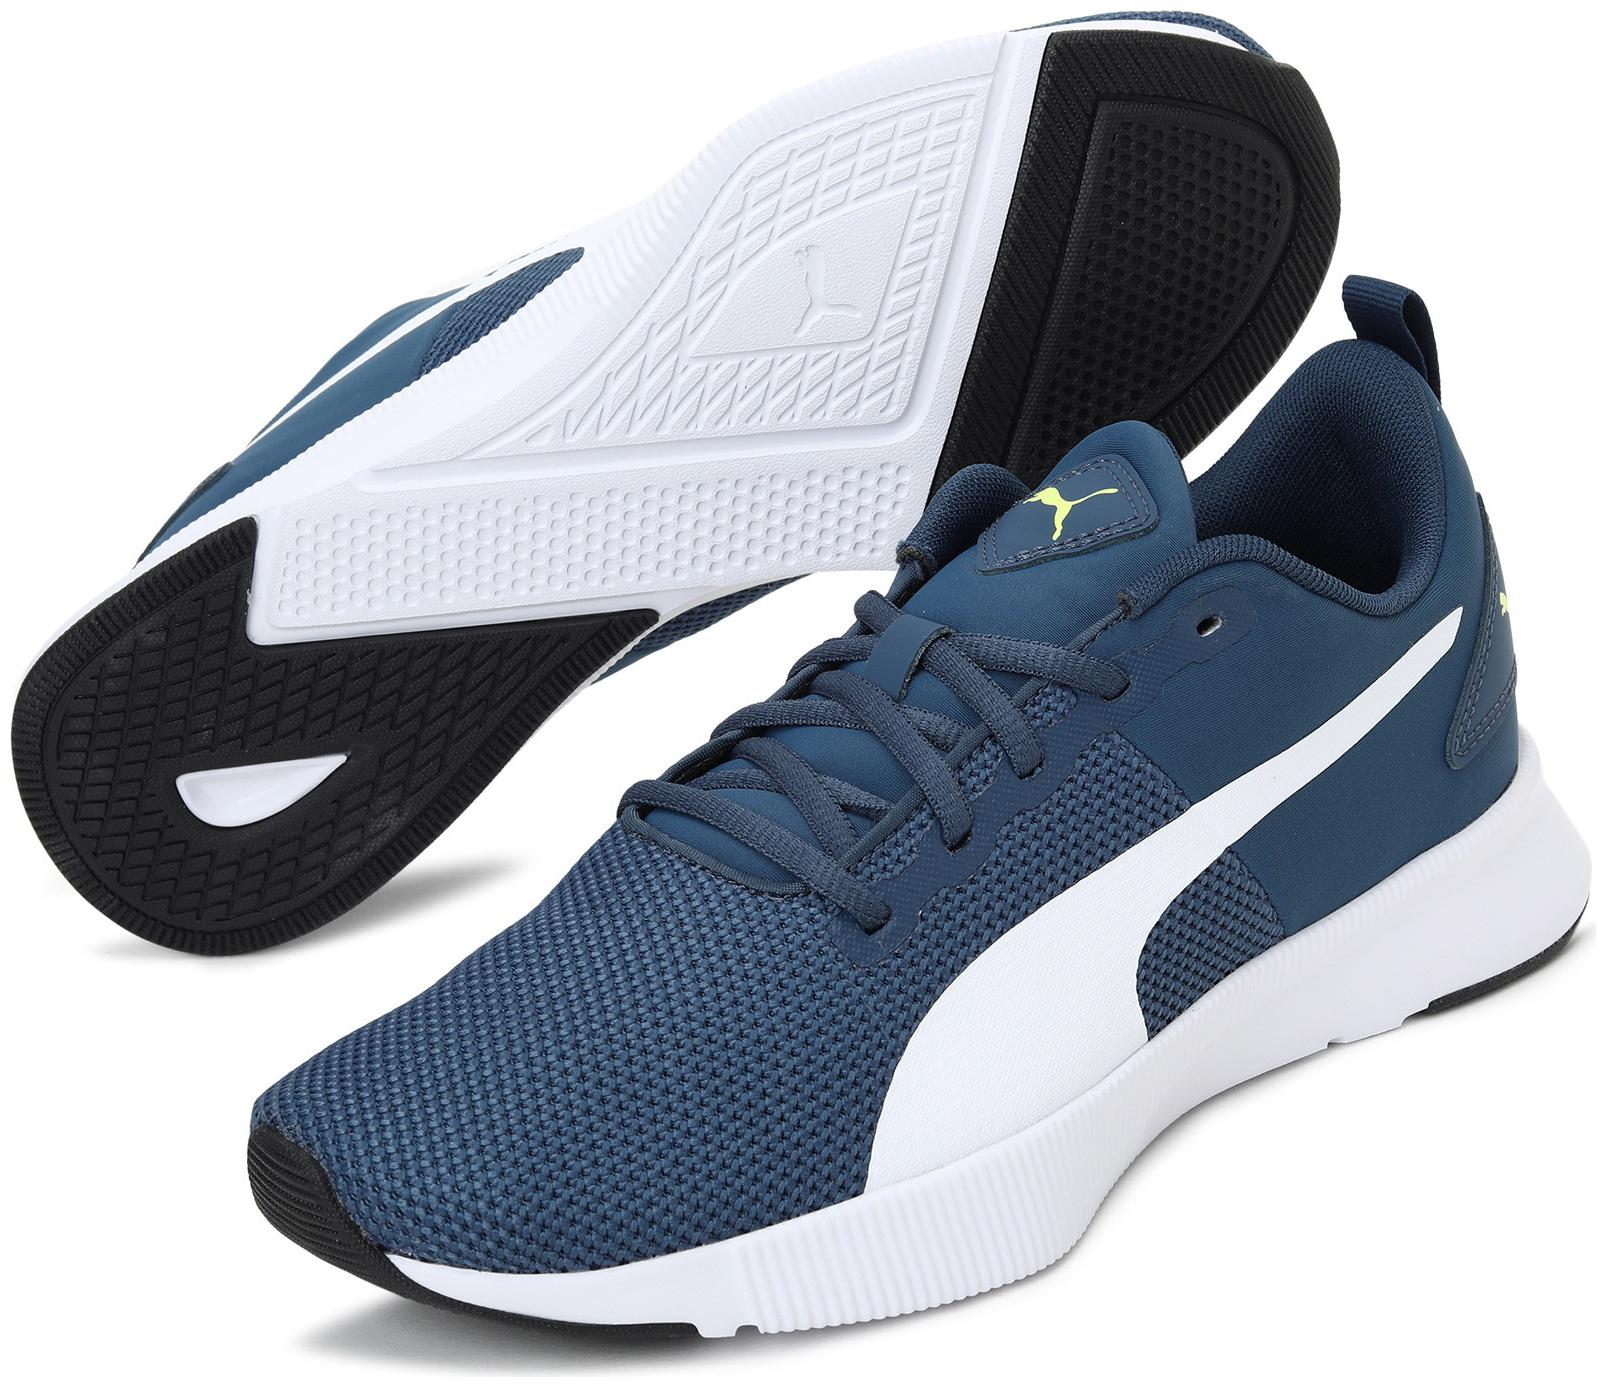 Buy Puma Sport Shoes online at best